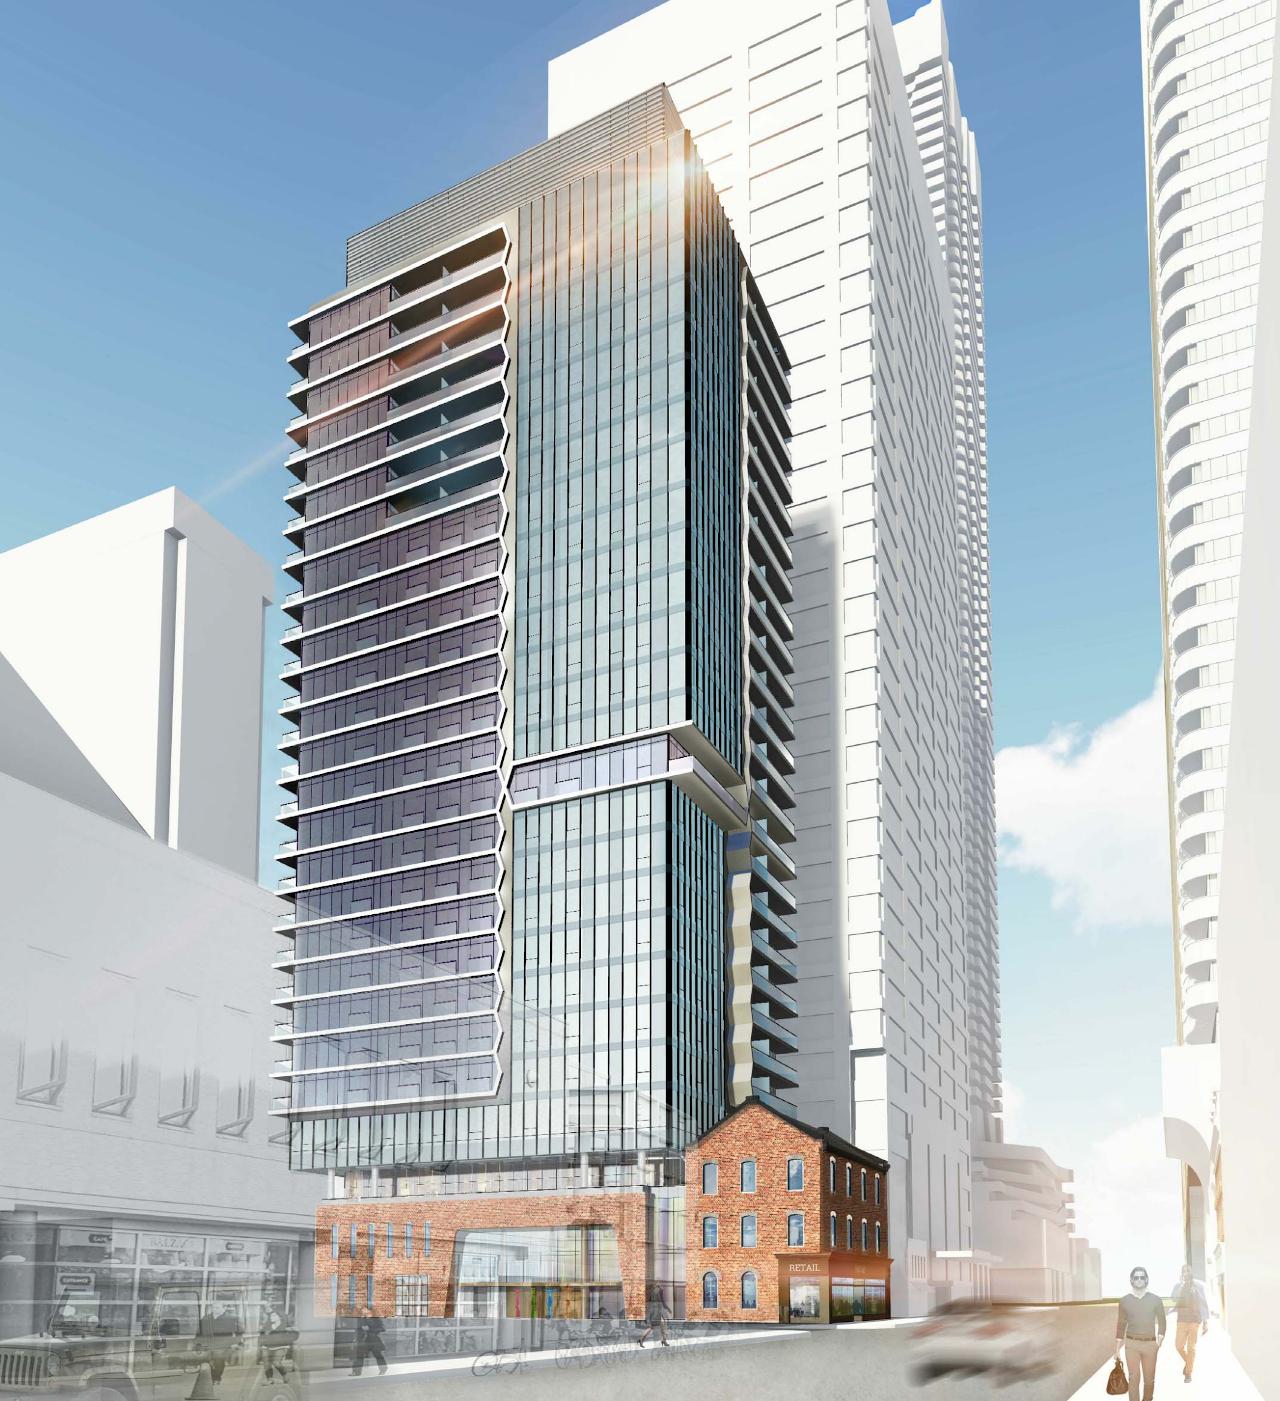 Adagio, 771 Yonge Street, Toronto, Giannone Petricone Associates for Menkes Developments